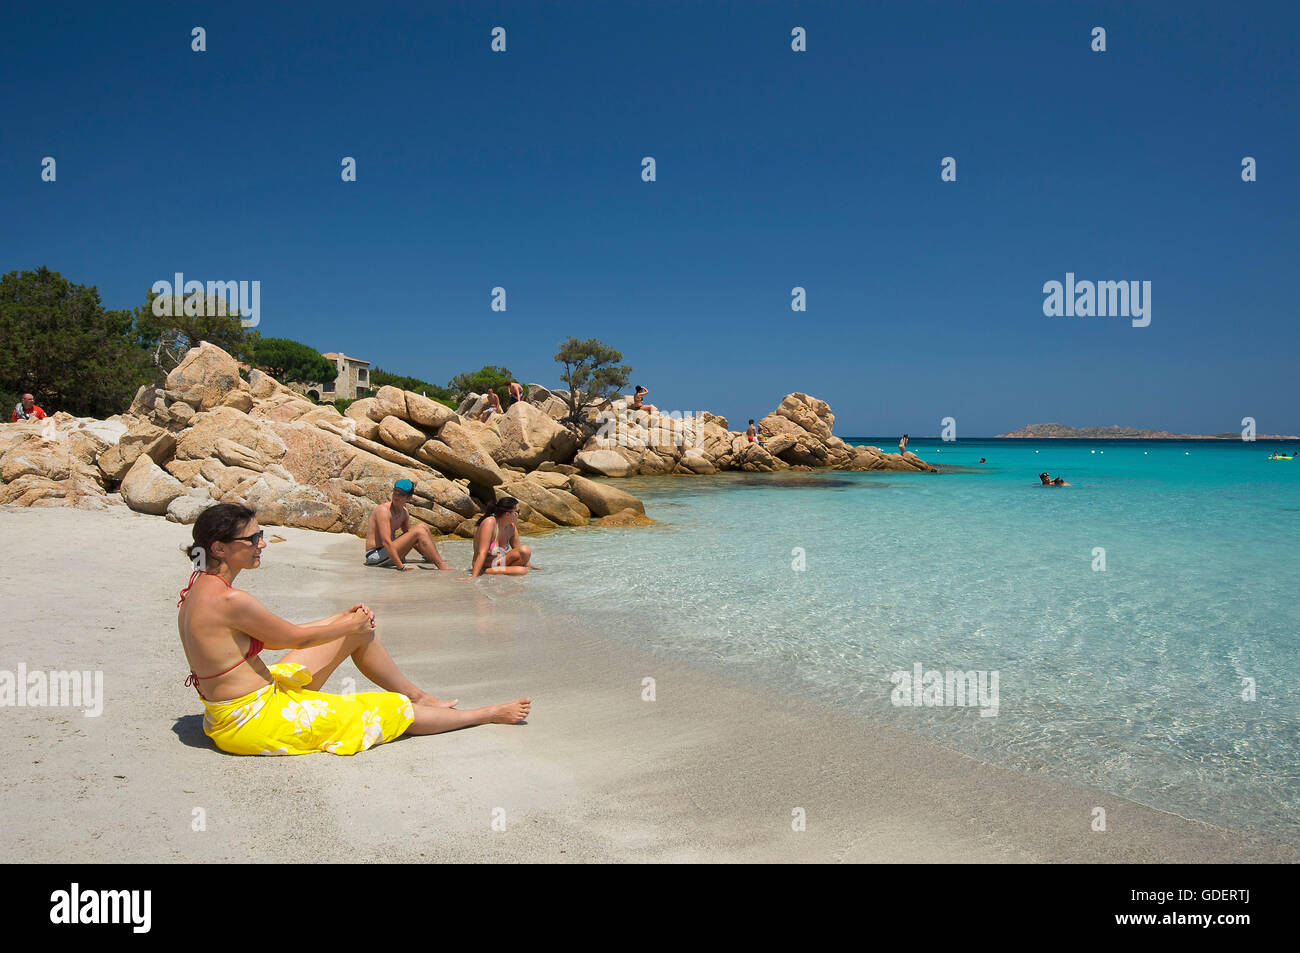 Capriccioli  Beach, Costa Smeralda, Sardinia, Italy Stock Photo